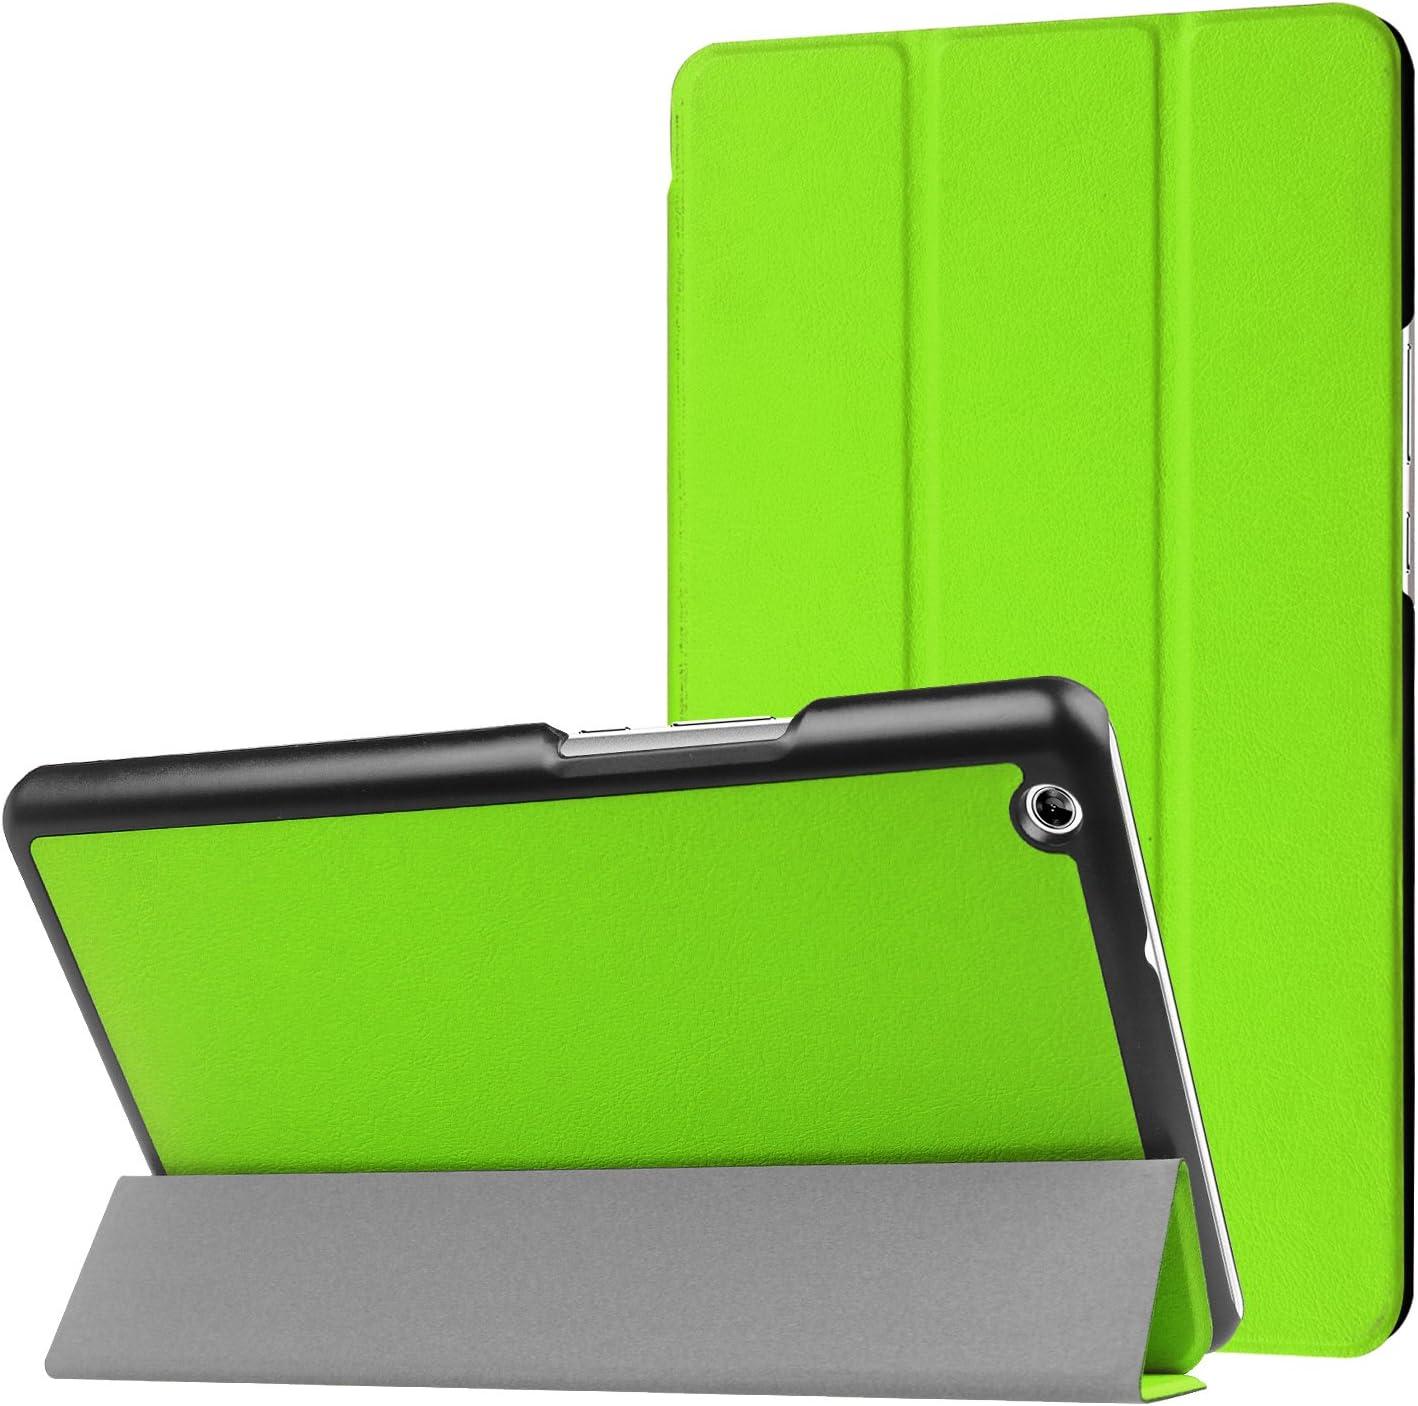 MediaPad M3 Lite 8.0 Case Heavy Duty Ultra Lightweight Slim Smart shell Stand Cover Case Auto Sleep blue Wake Up for Huawei MediaPad M3 Lite 8.0 Inch Tablet